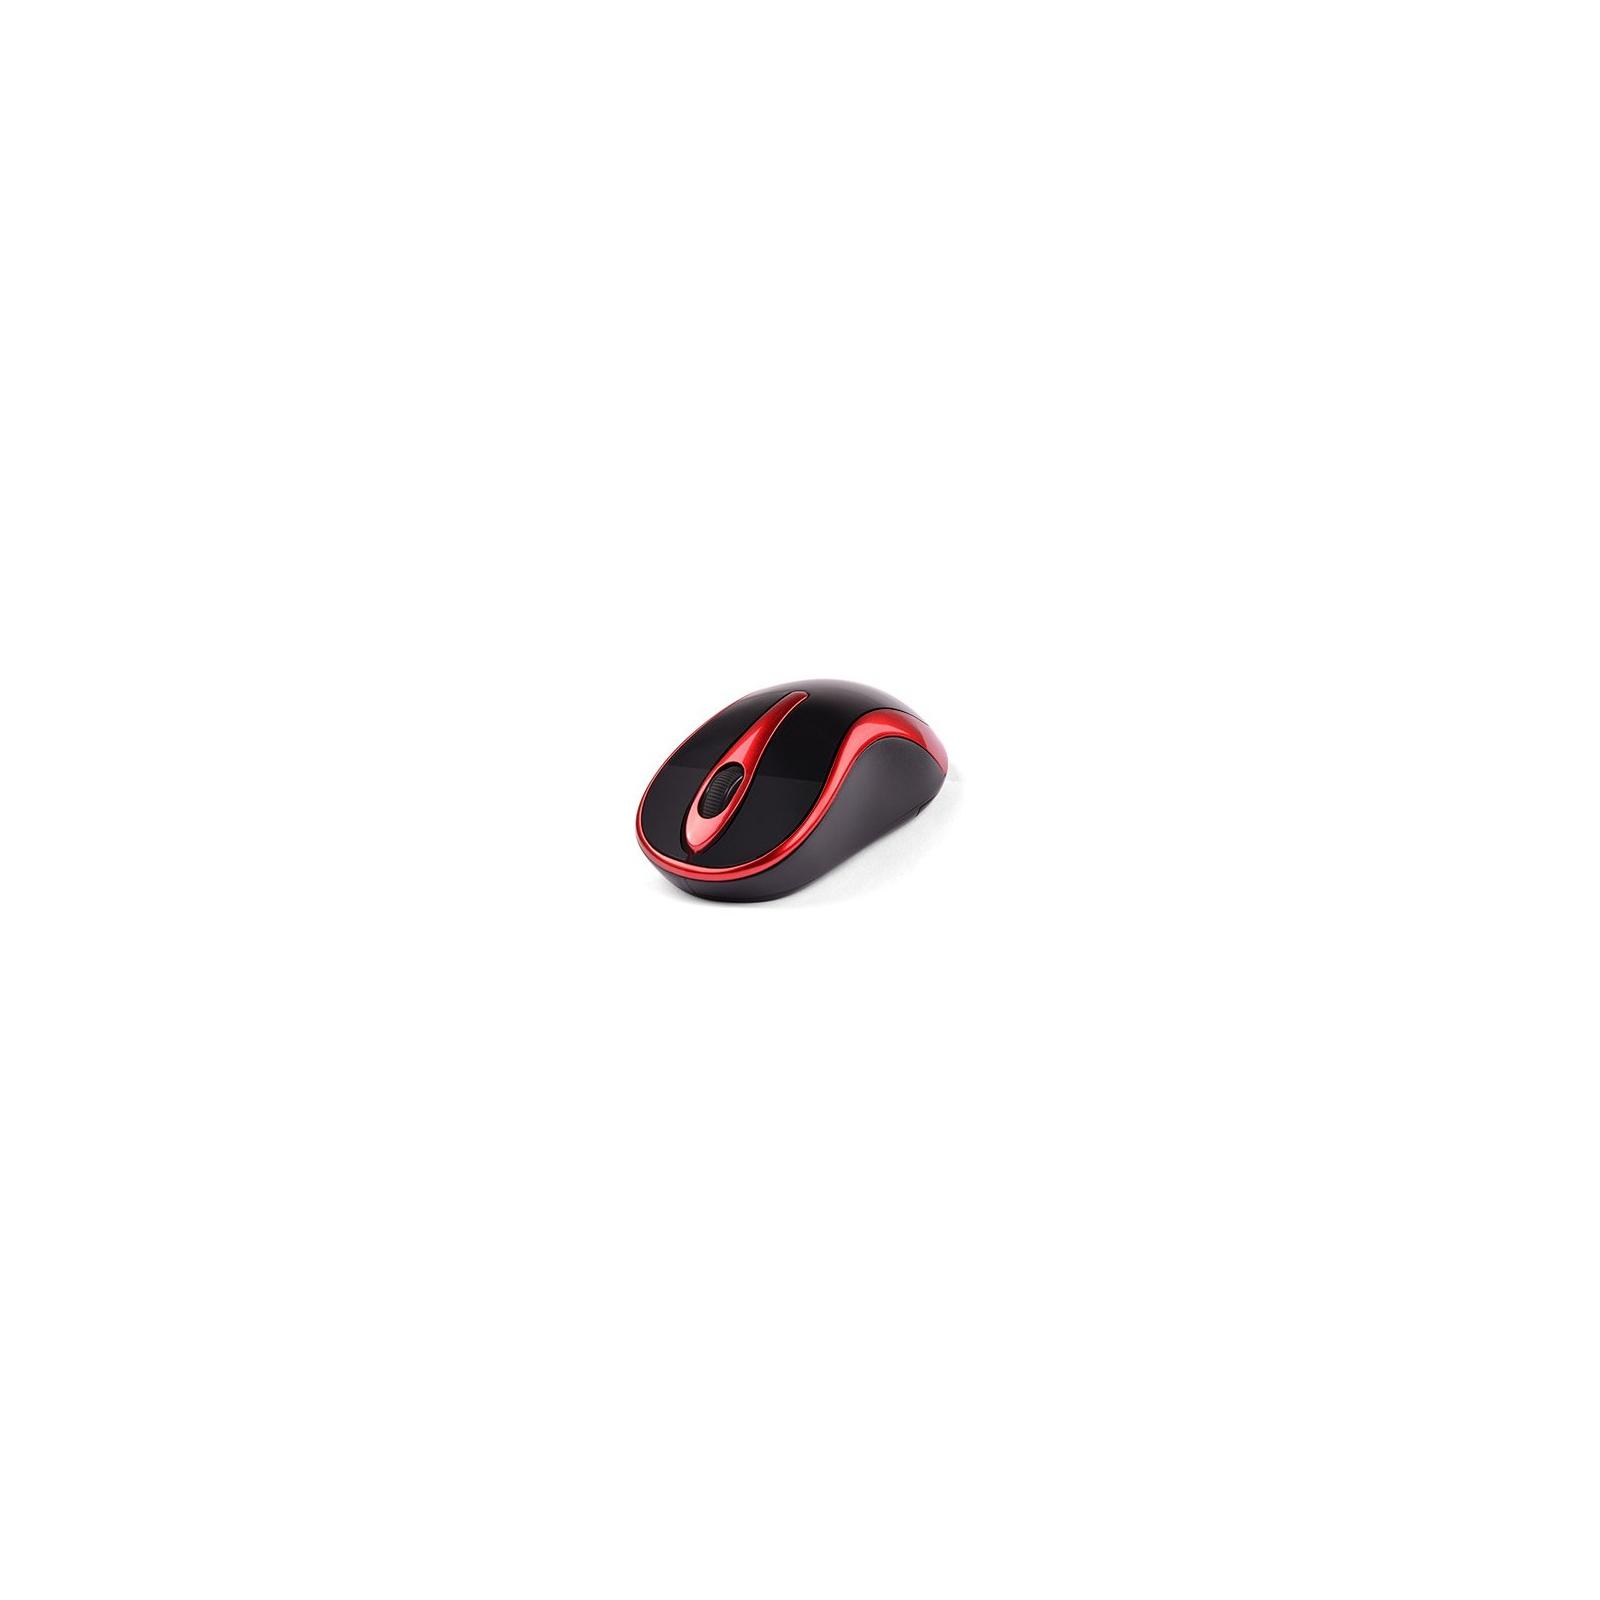 Мышка A4tech G3-280N Black-Red изображение 2